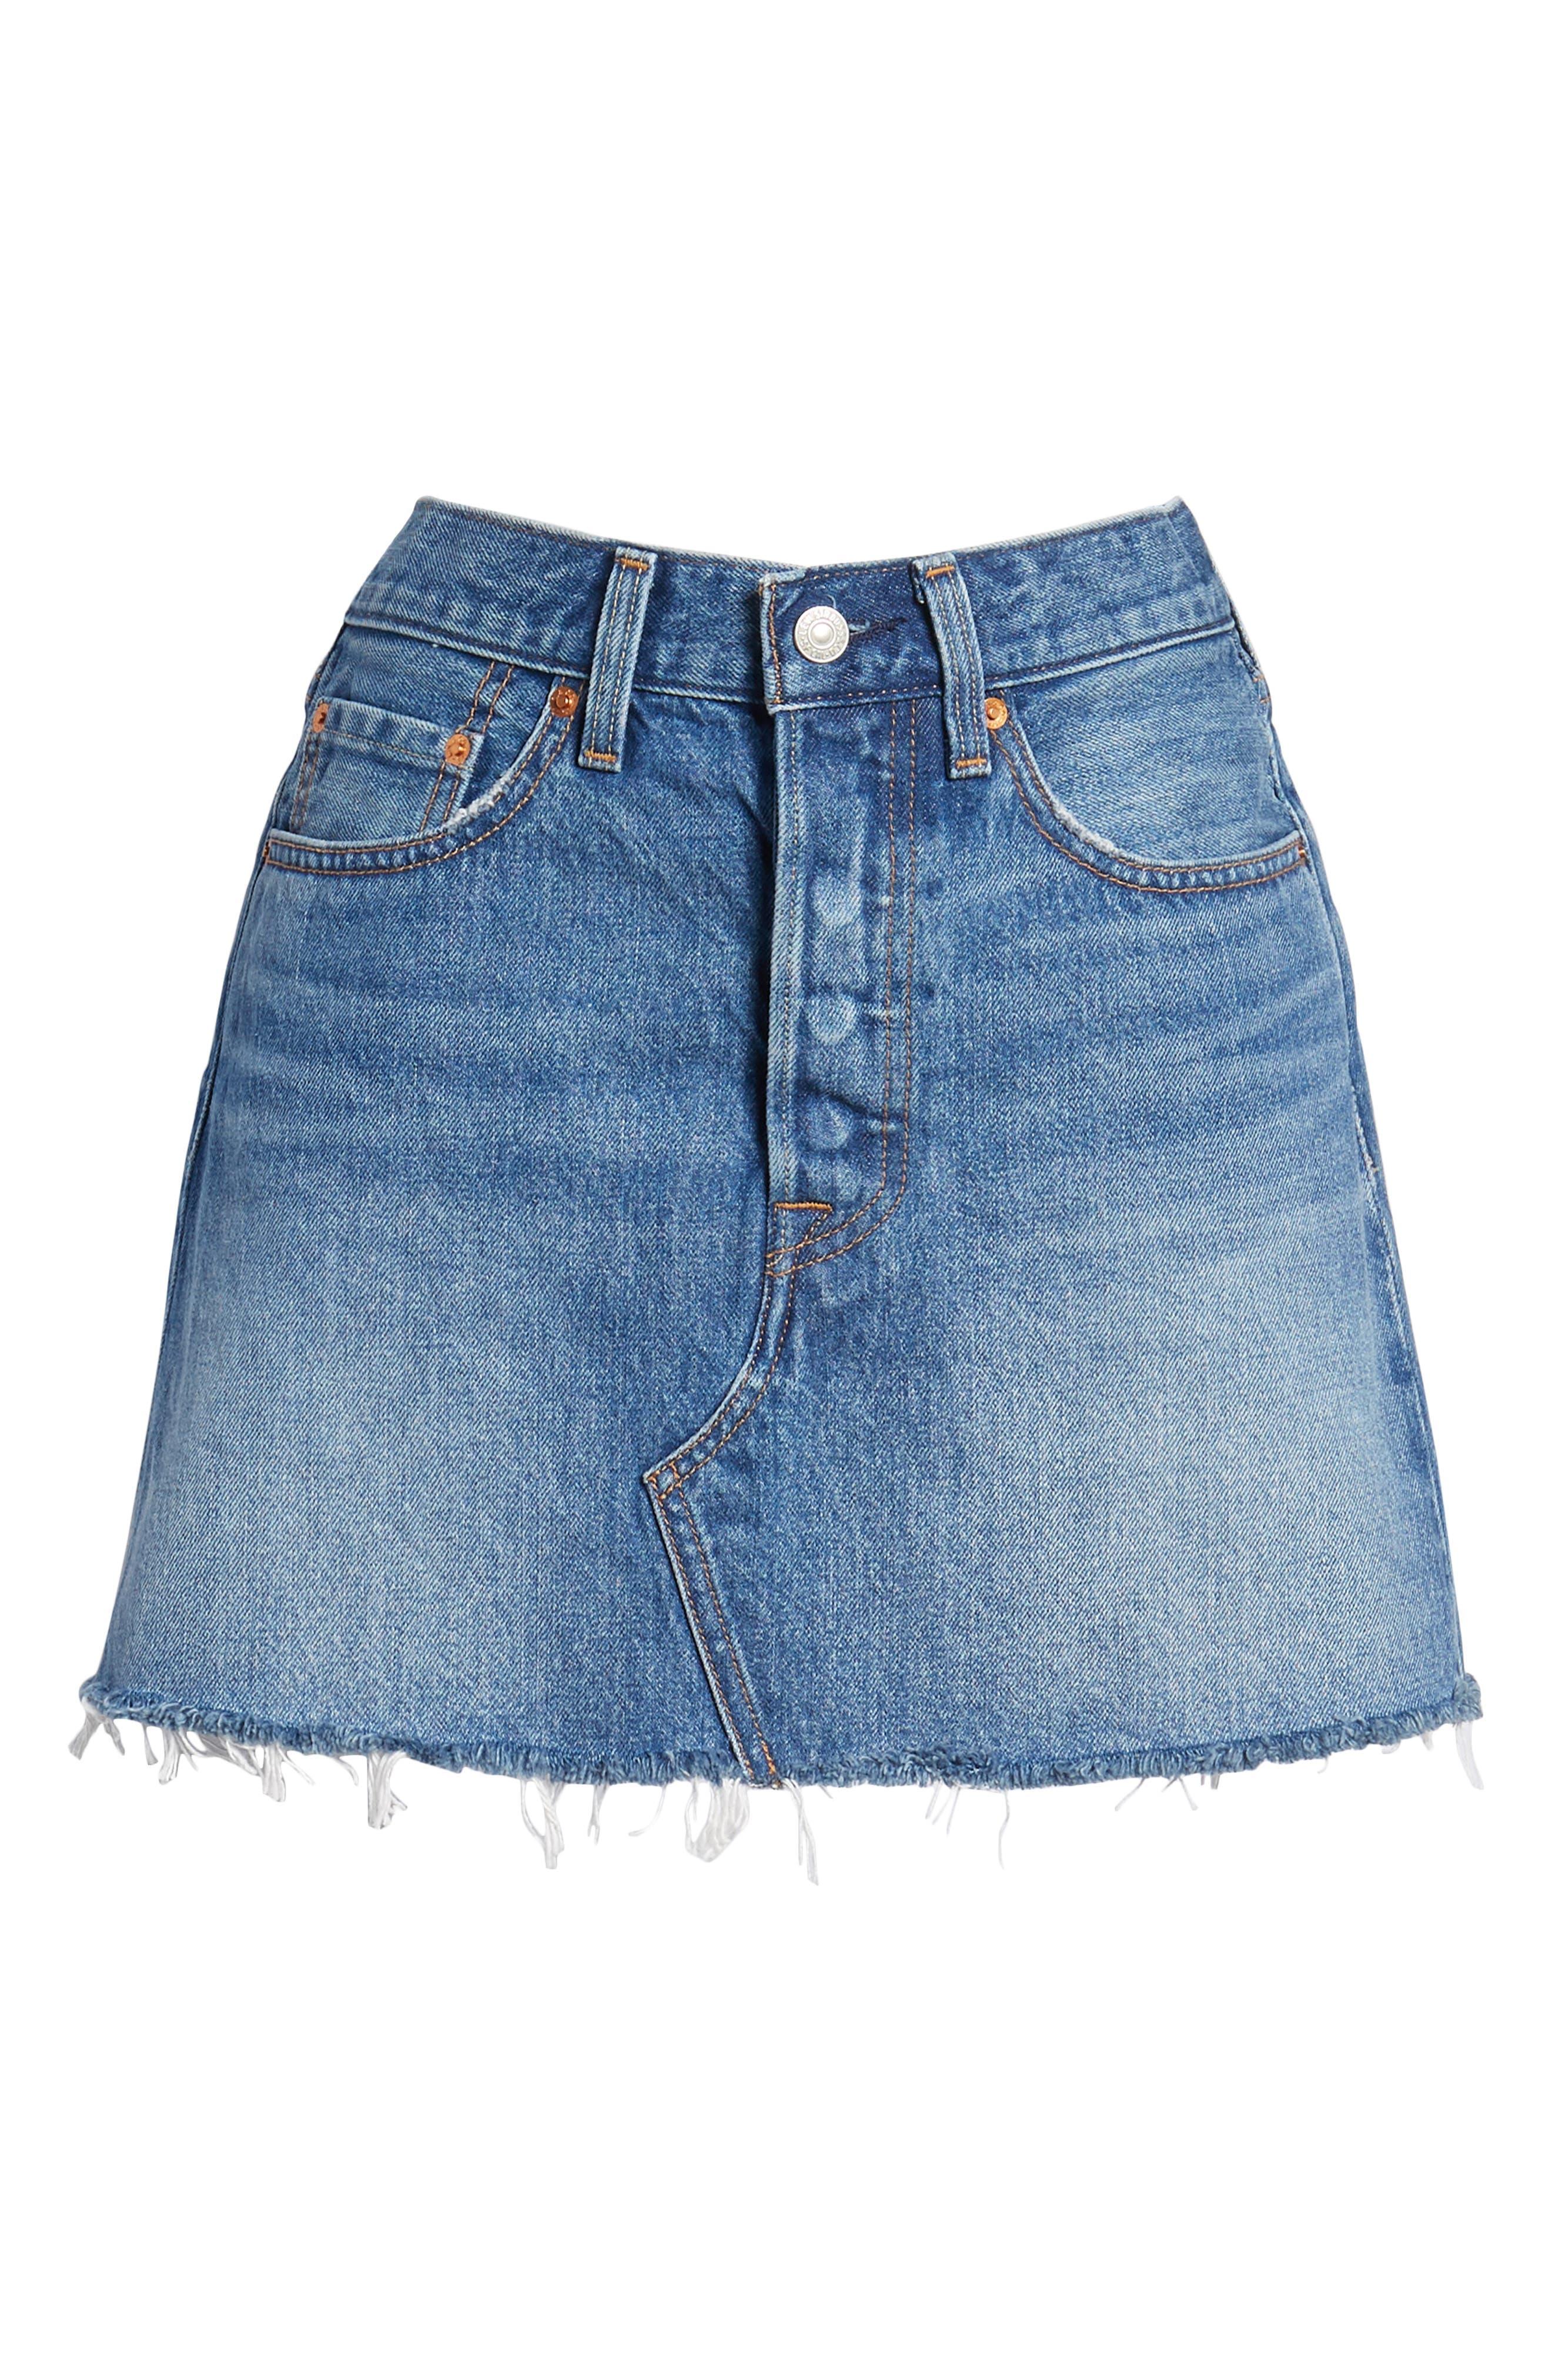 LEVI'S<SUP>®</SUP>, Deconstructed Denim Skirt, Alternate thumbnail 7, color, MIDDLE MAN